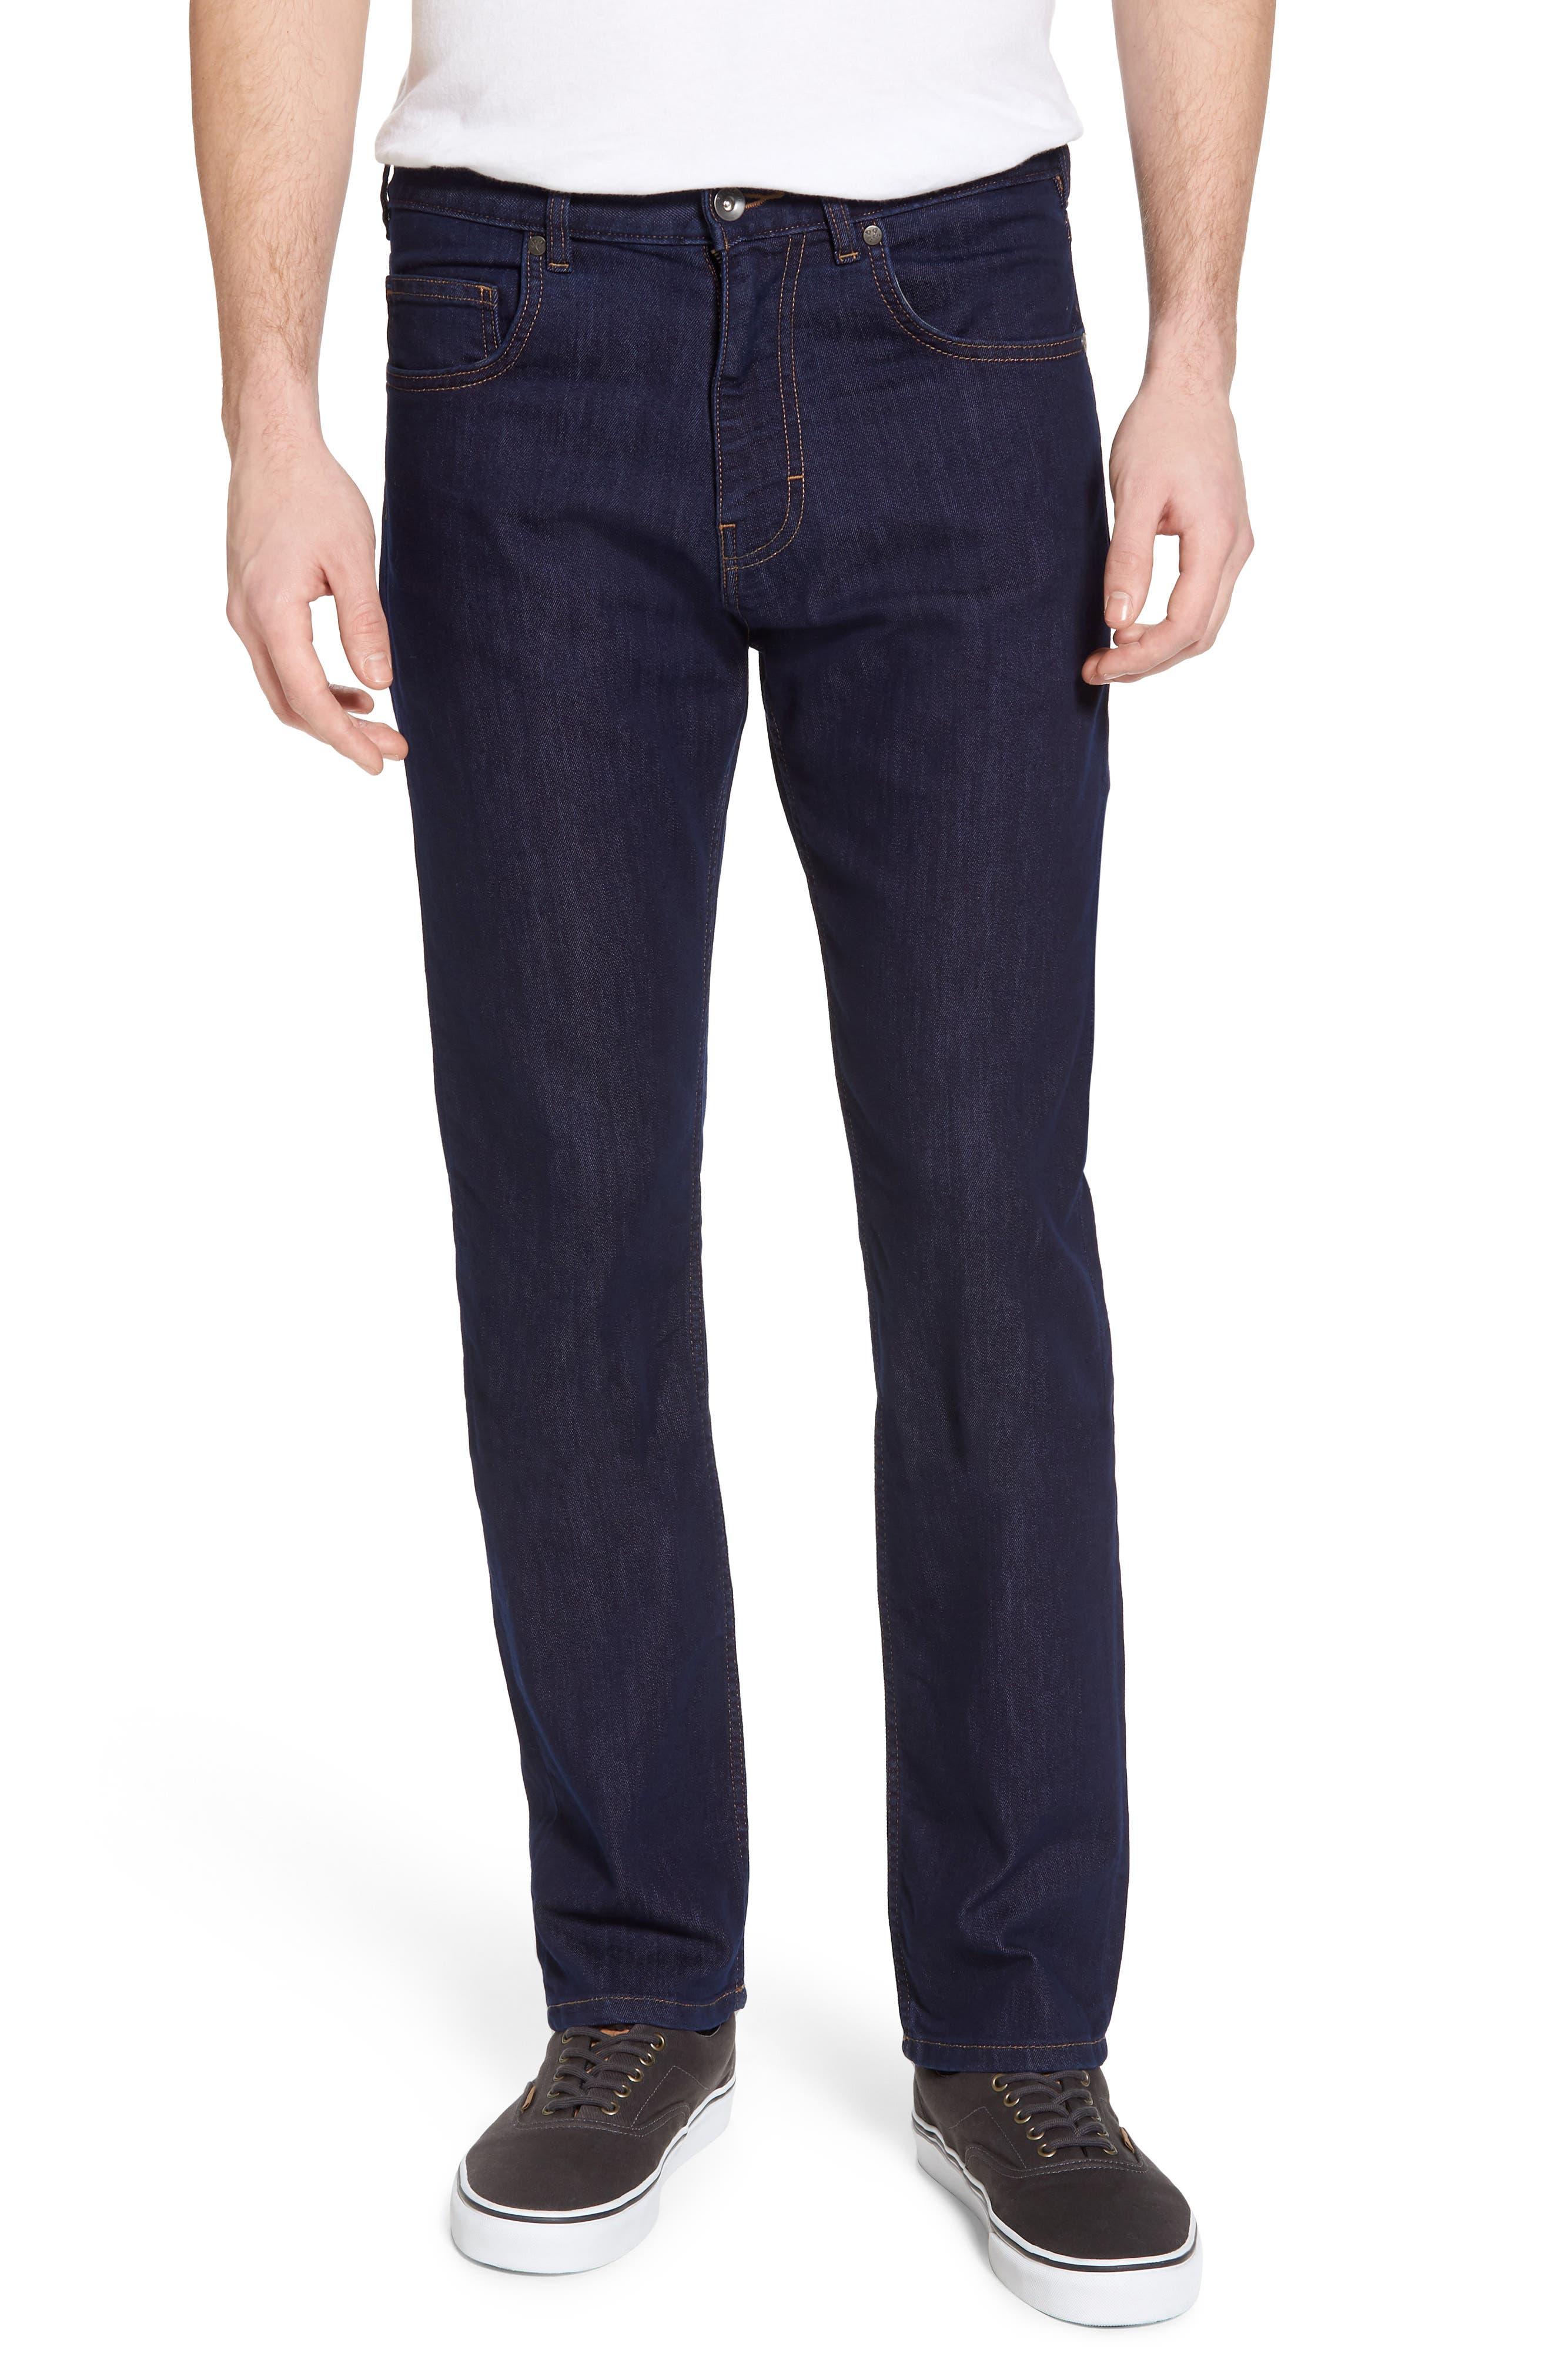 Straight Leg Performance Jeans,                         Main,                         color, Dark Denim